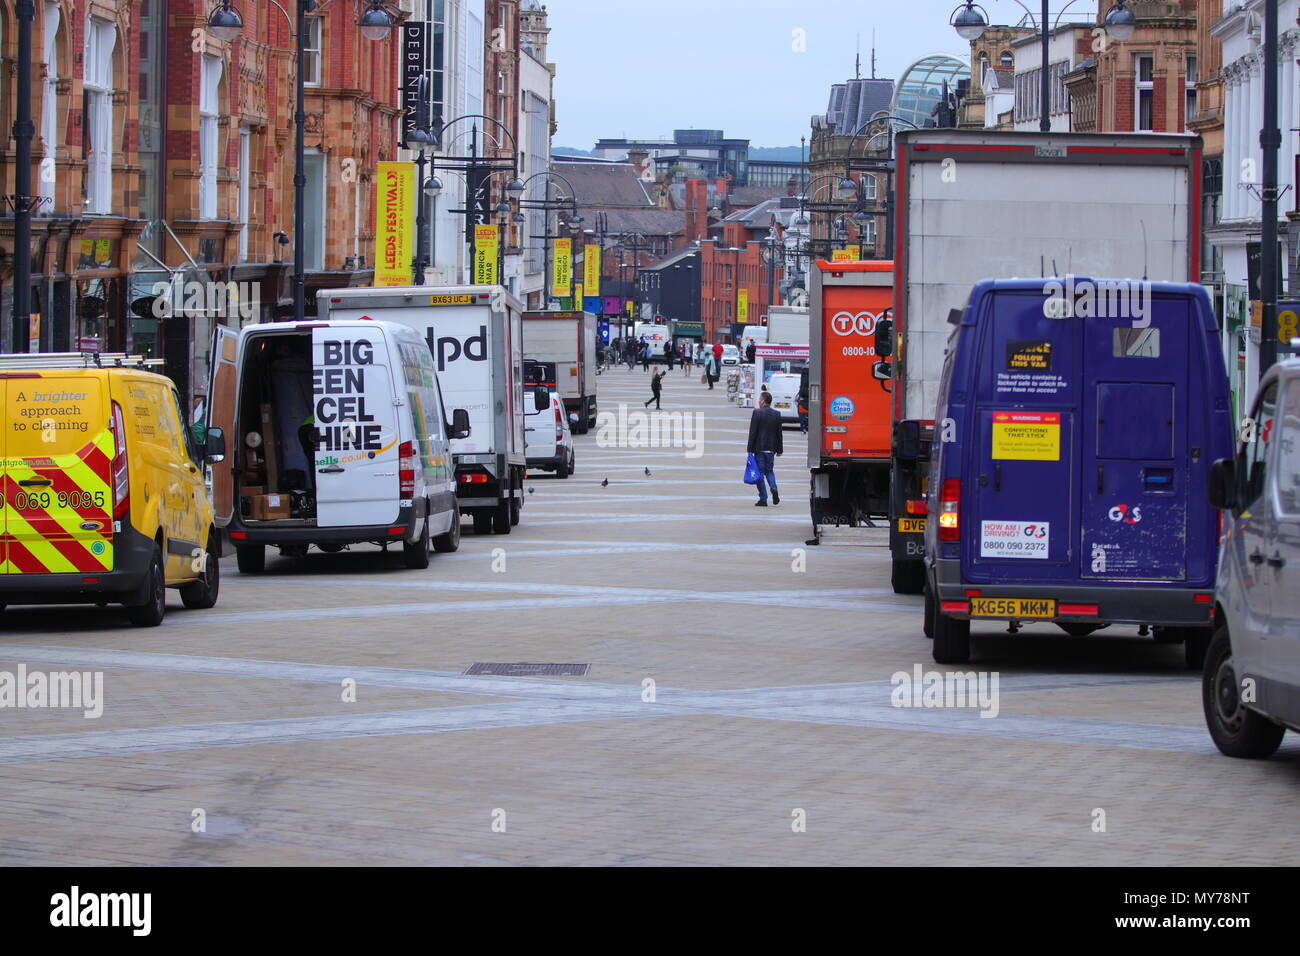 Pedestrianized zone on Briggate in Leeds - Stock Image